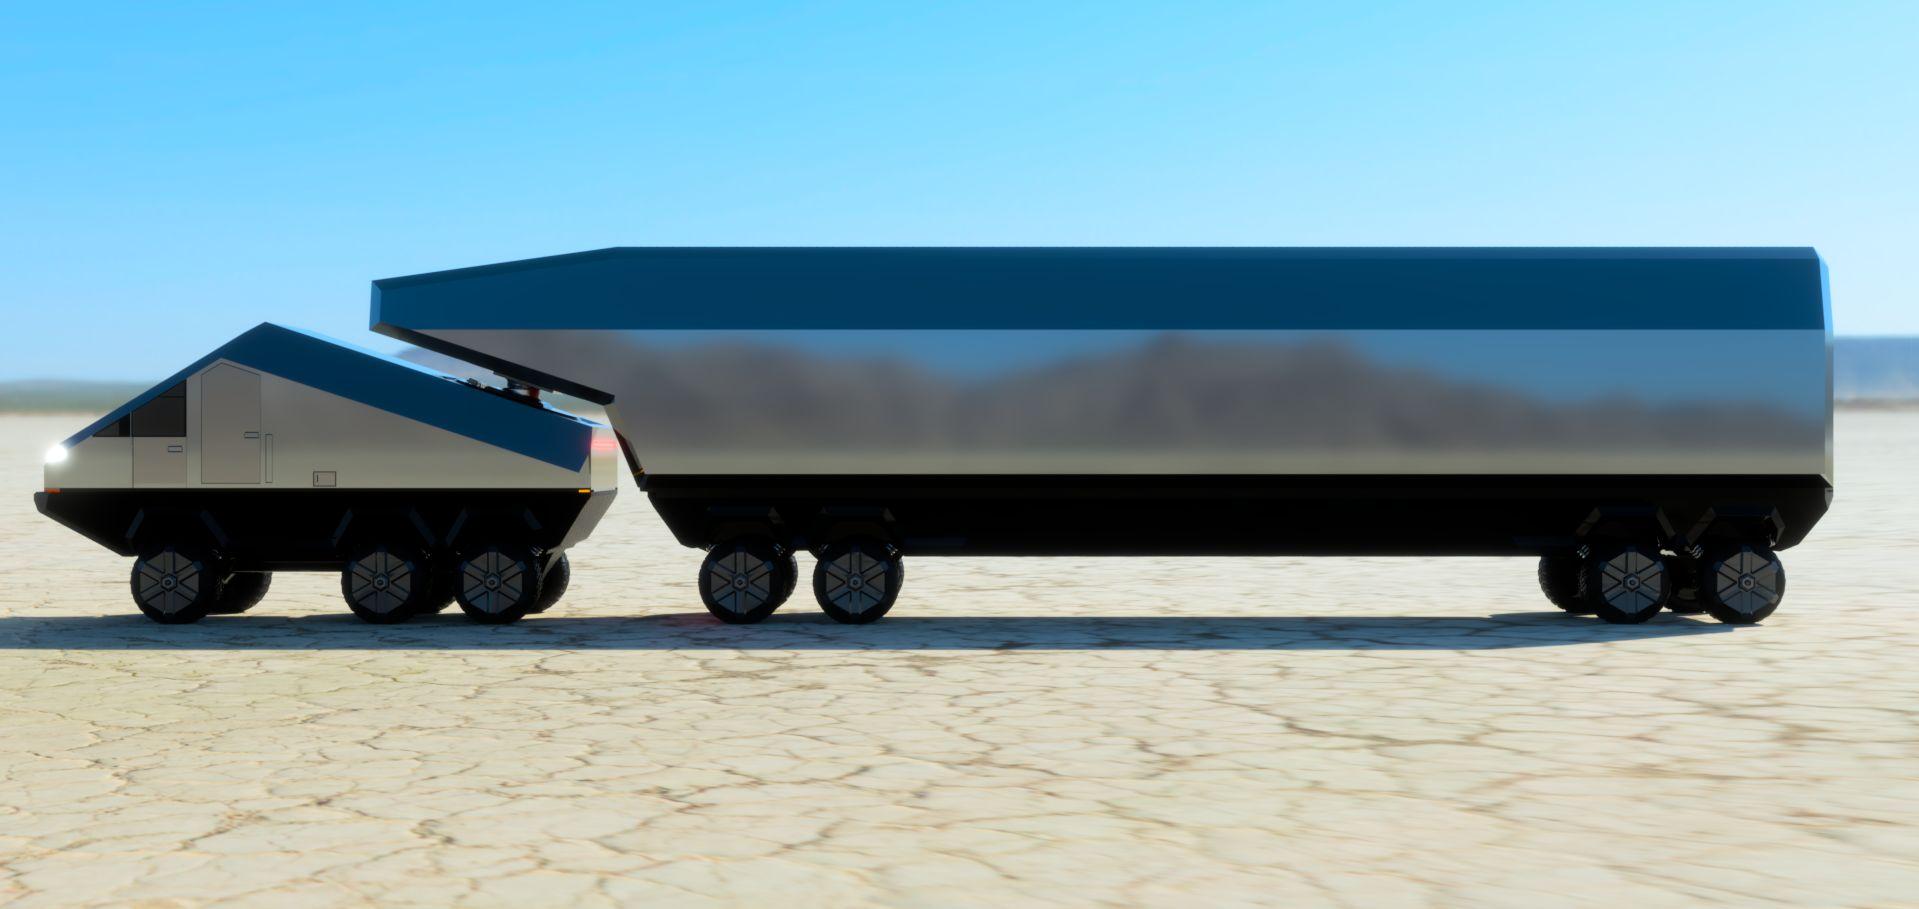 Tesla-cybervan-2020-apr-14-09-01-11am-000-customizedview26430598767-png-3500-3500